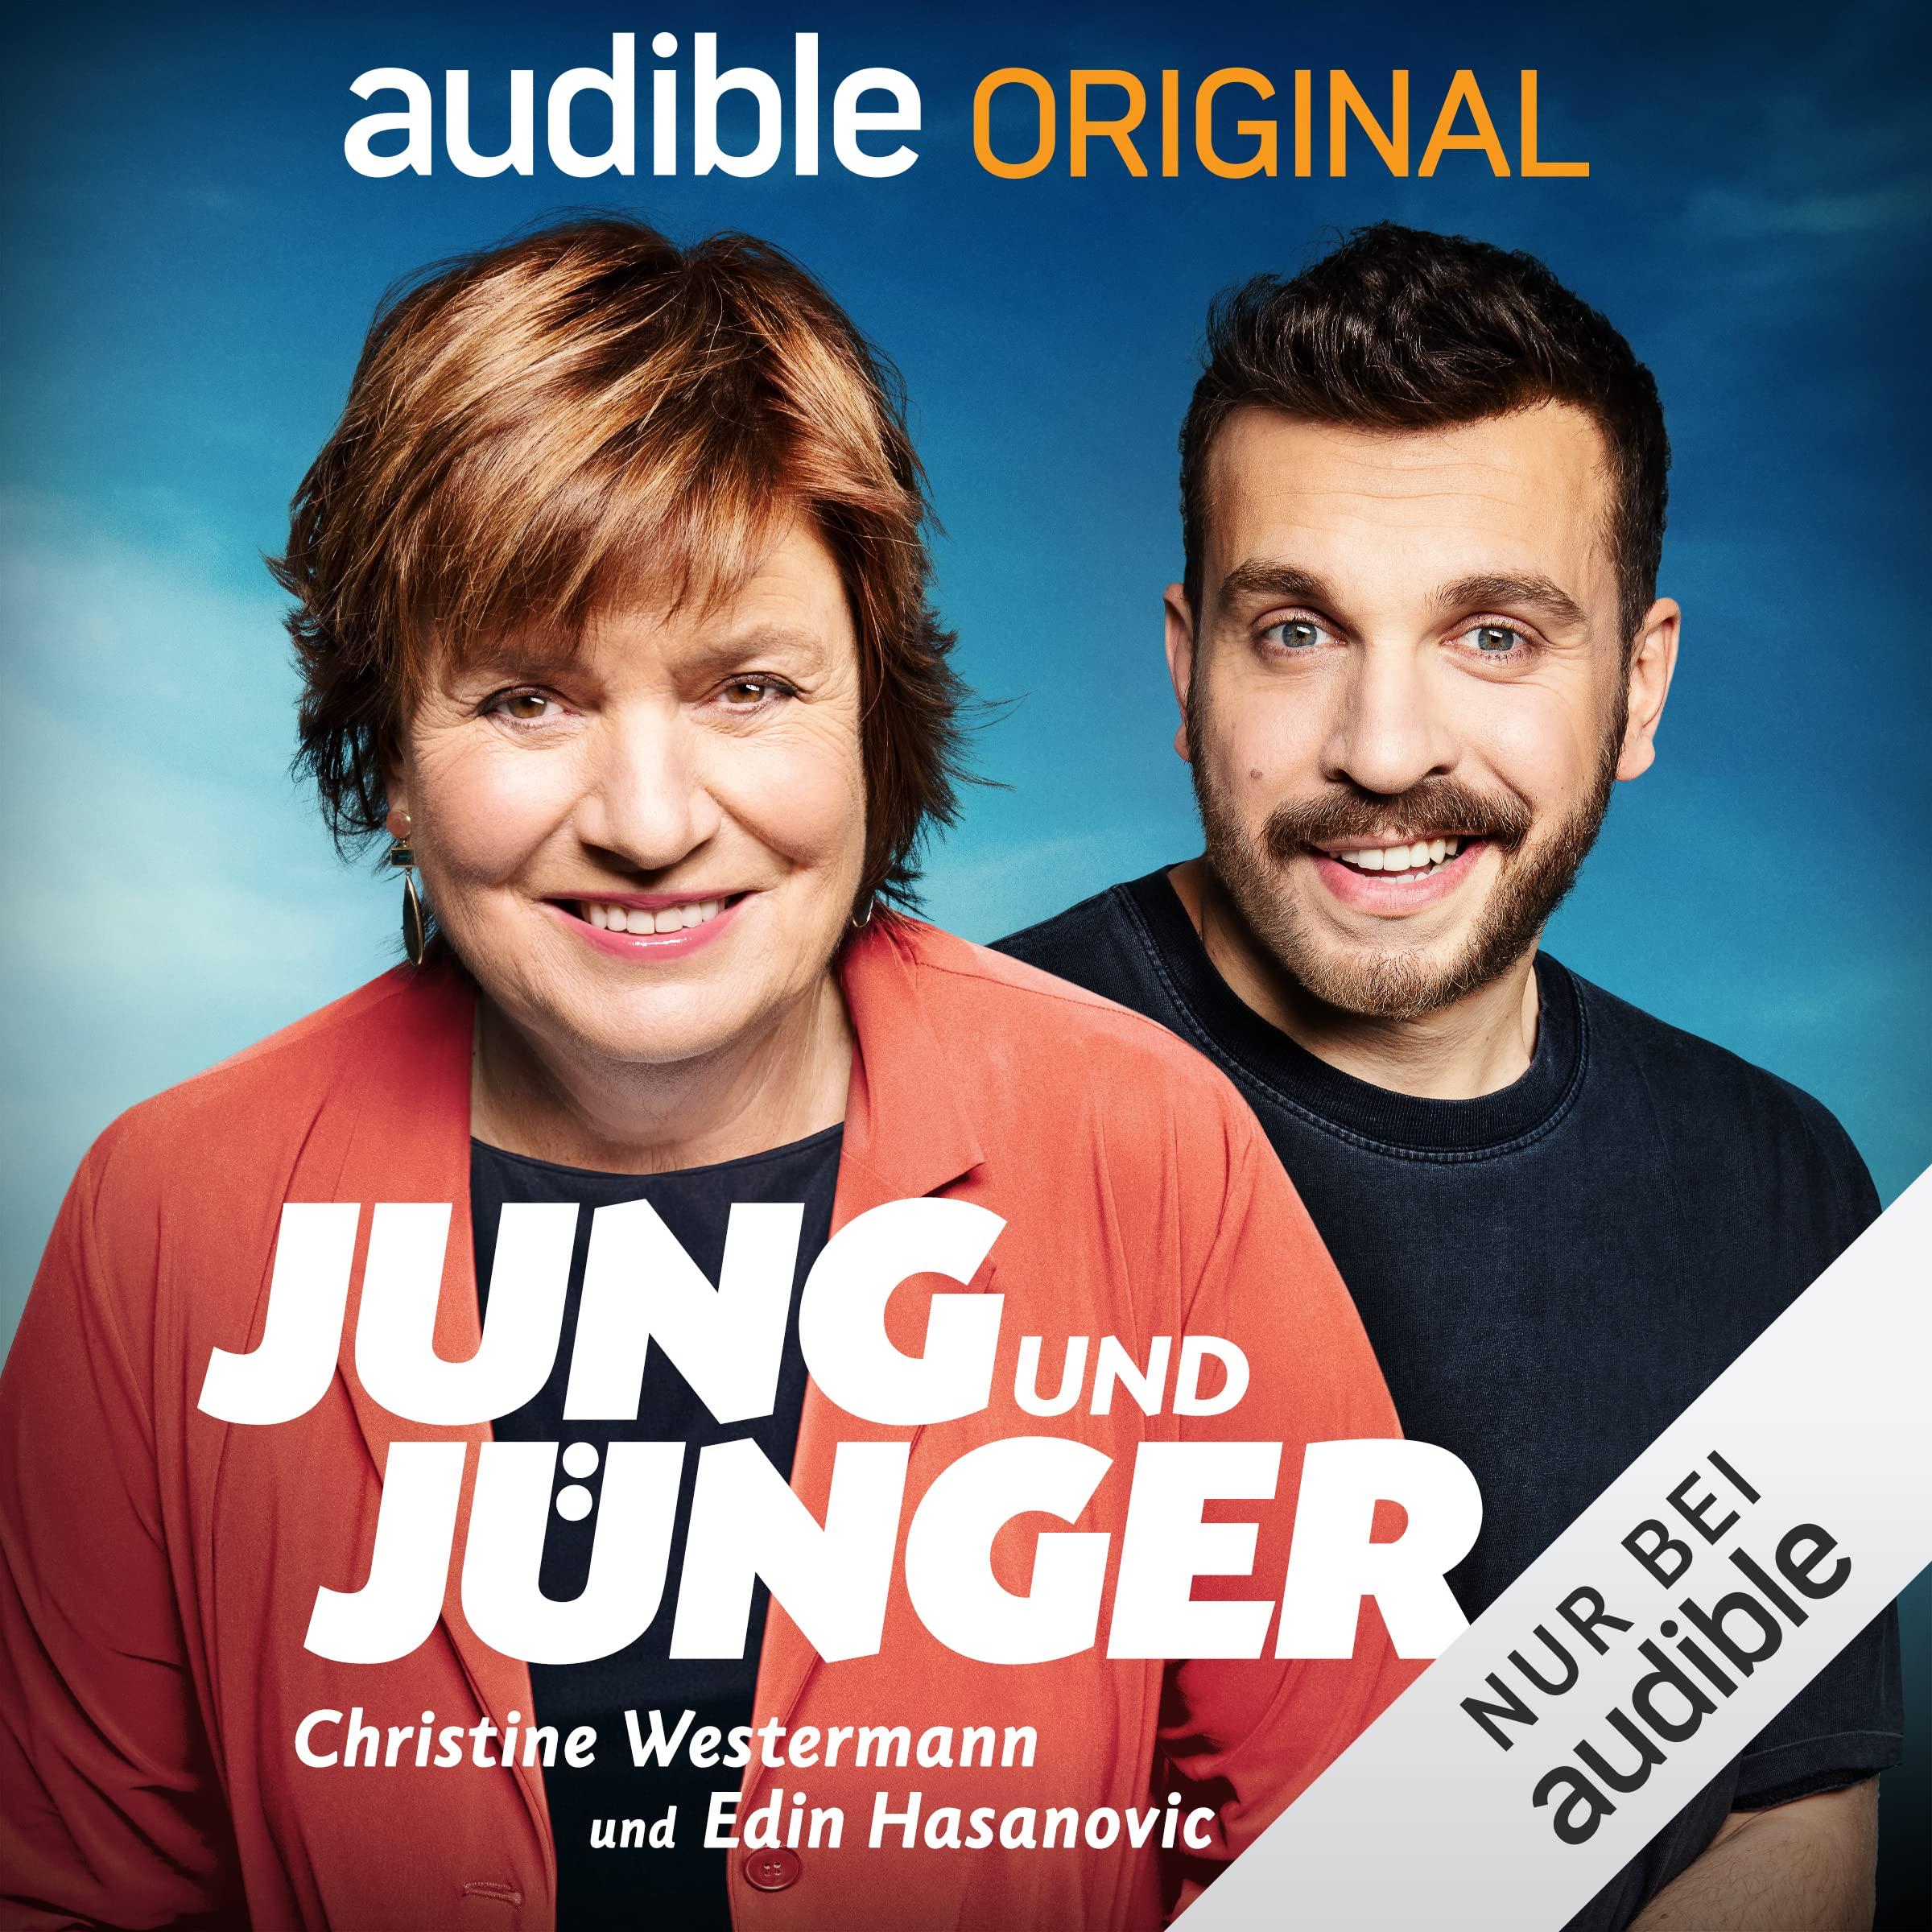 jung und jünger (Original Podcast)